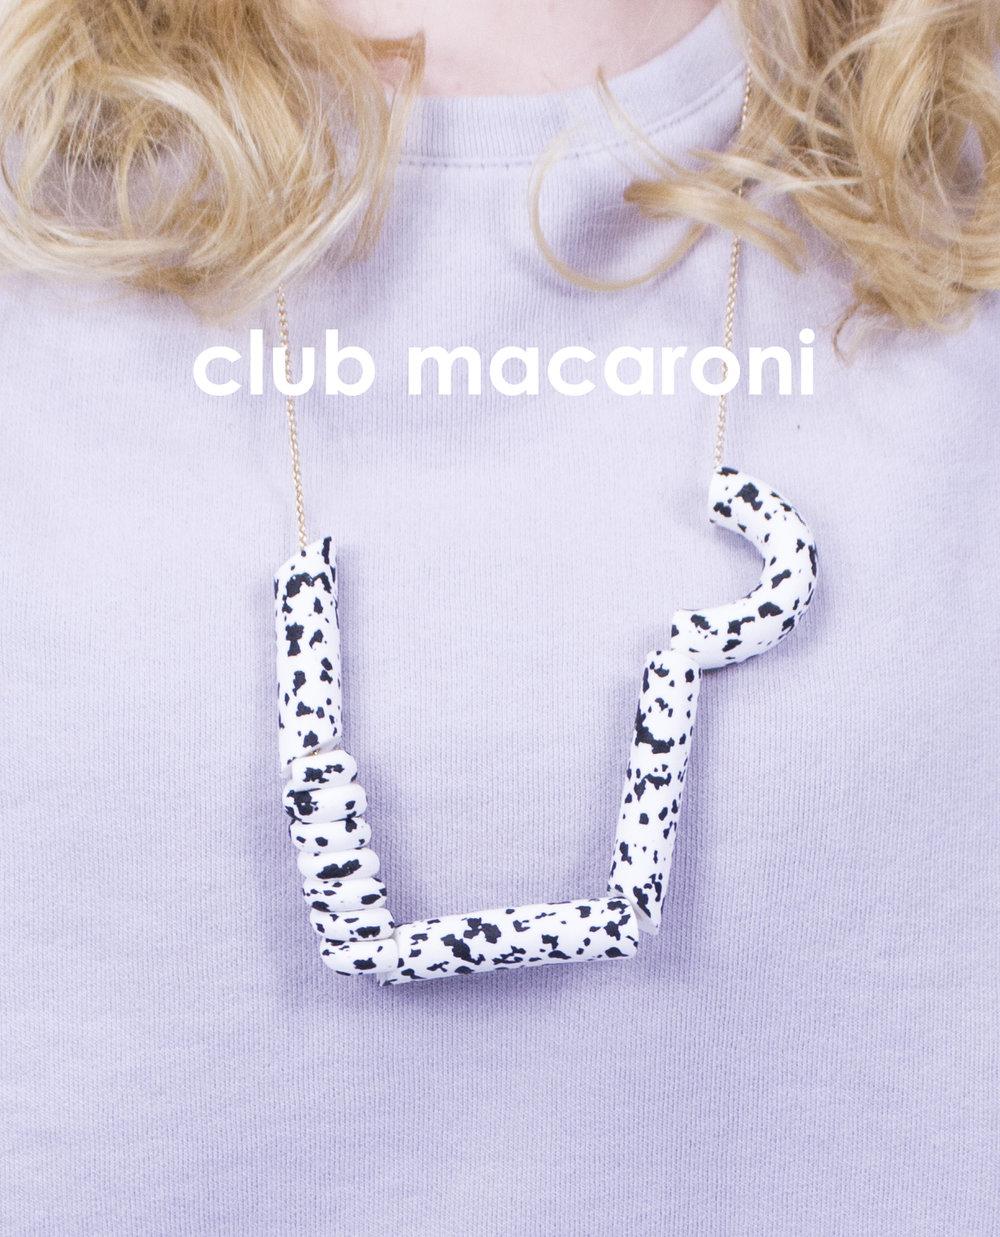 CLUB MACARONI.jpg